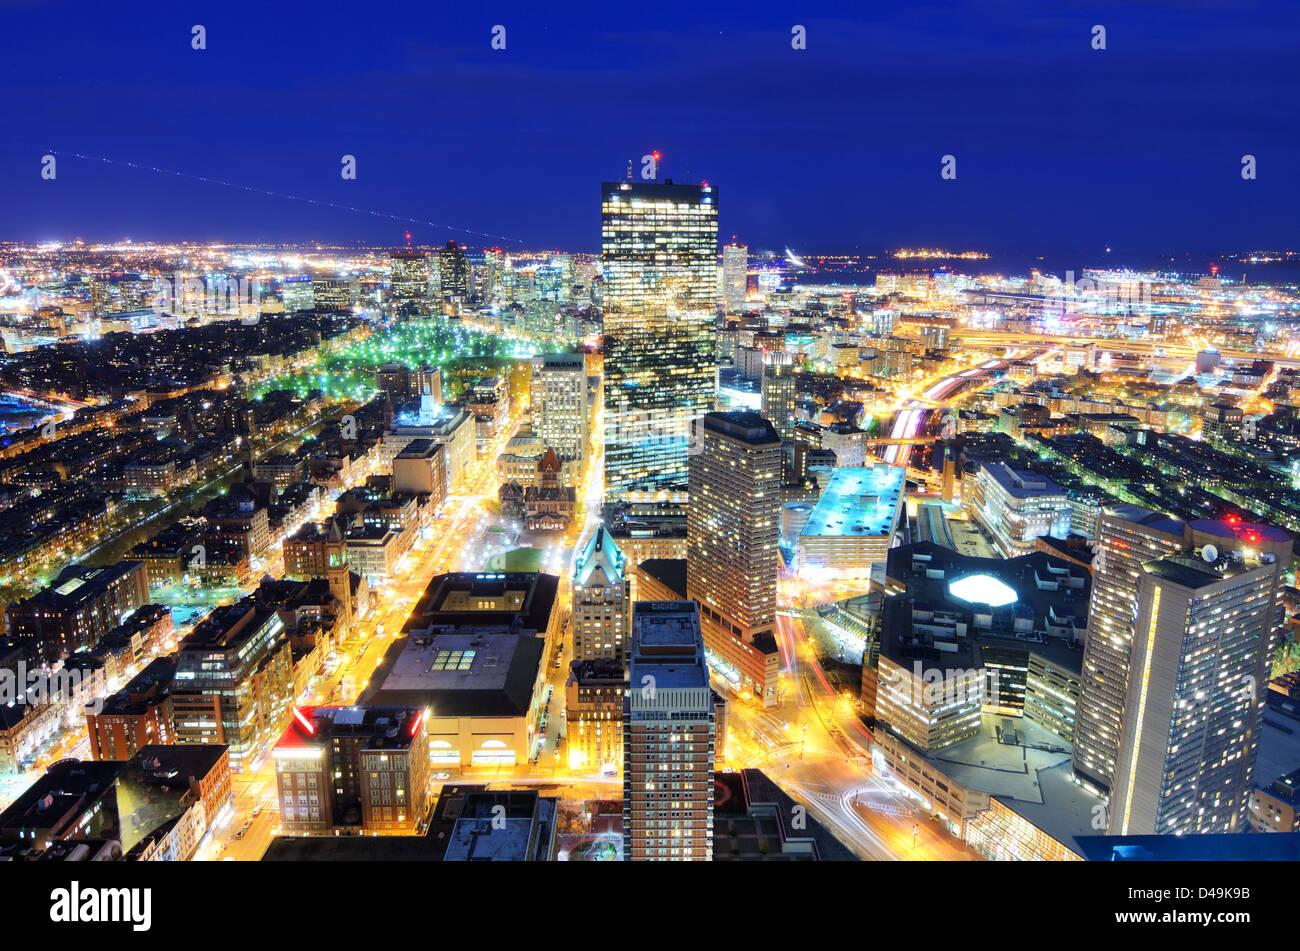 Vista aérea de la ciudad de Boston, Massachusetts, EE.UU. Imagen De Stock